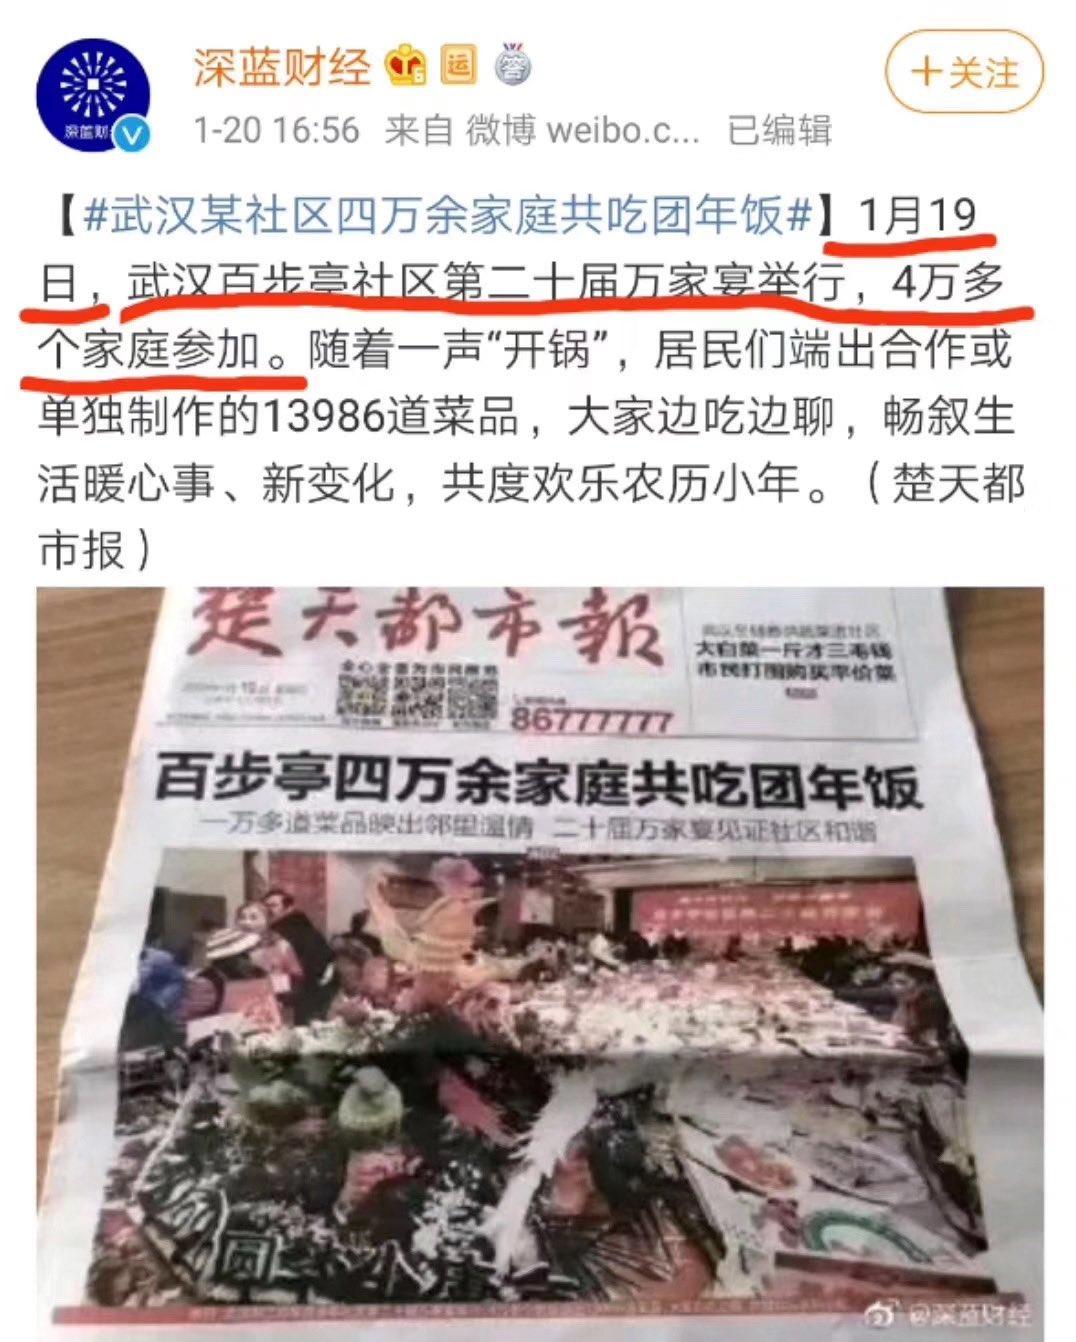 Image result for 2020年1月18日武汉百花亭四万家共赴大宴